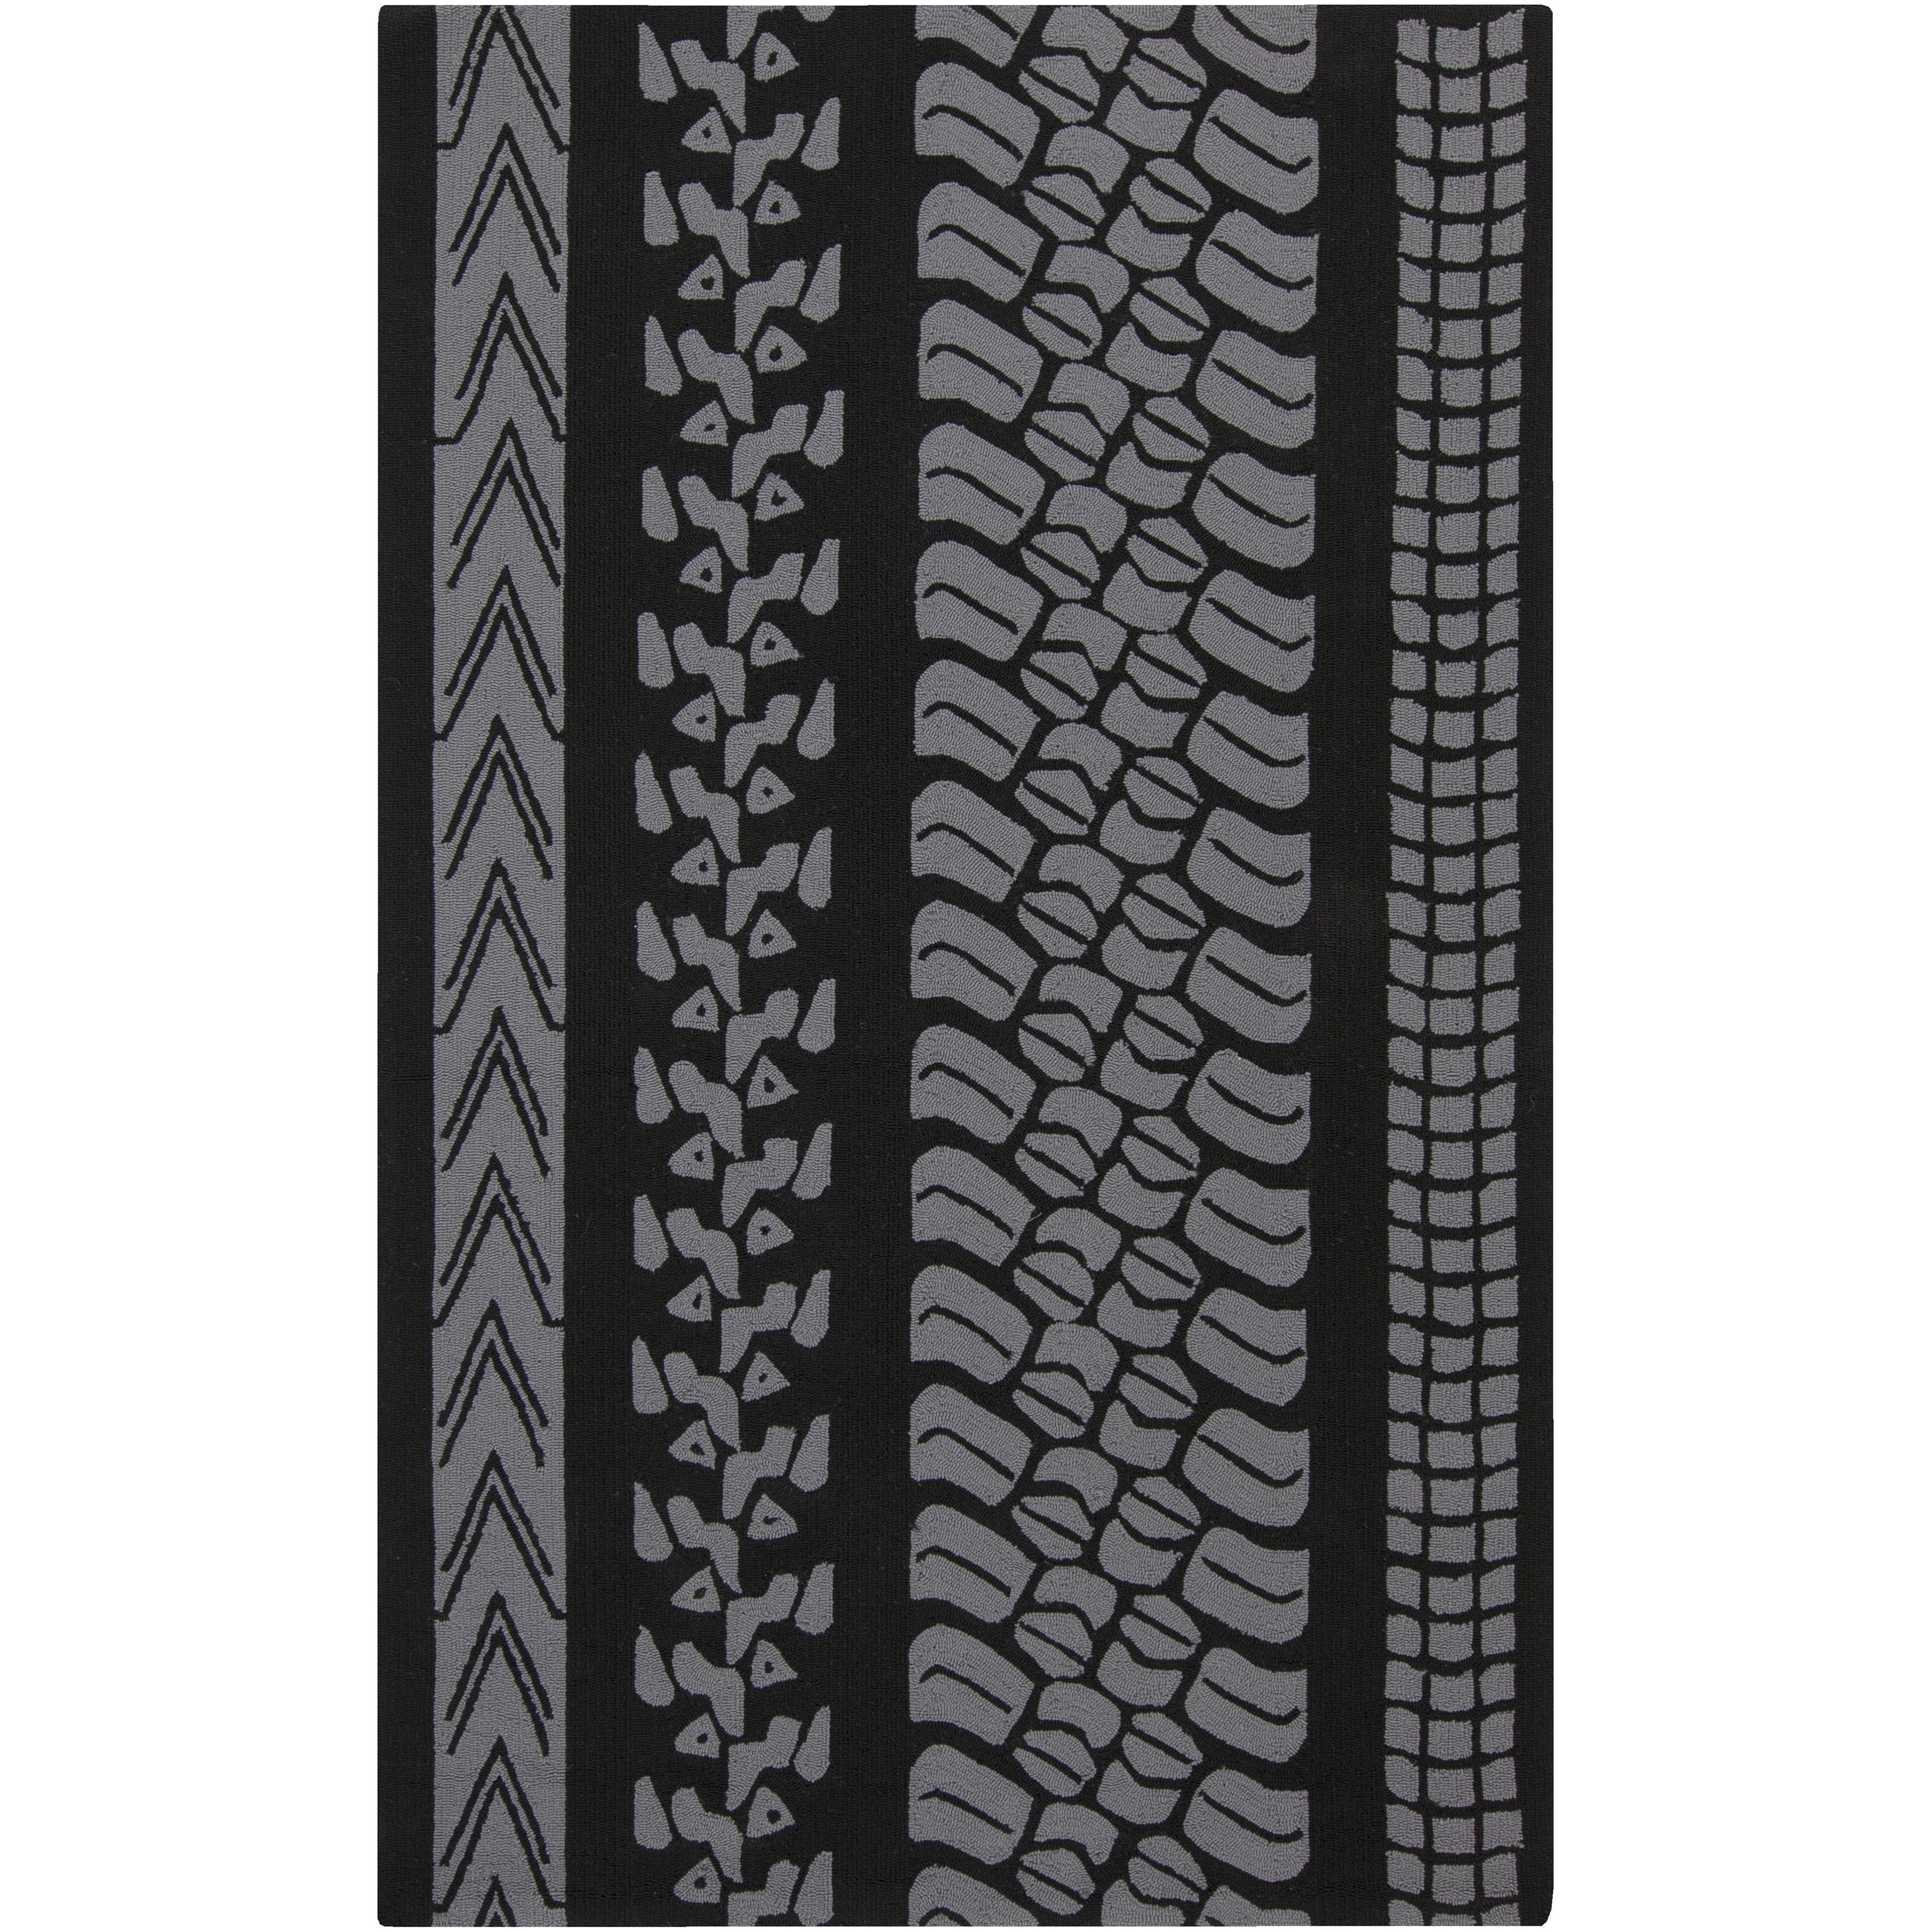 Surya Rugs Pandemonium 3' x 5' - Item Number: PDM1006-35